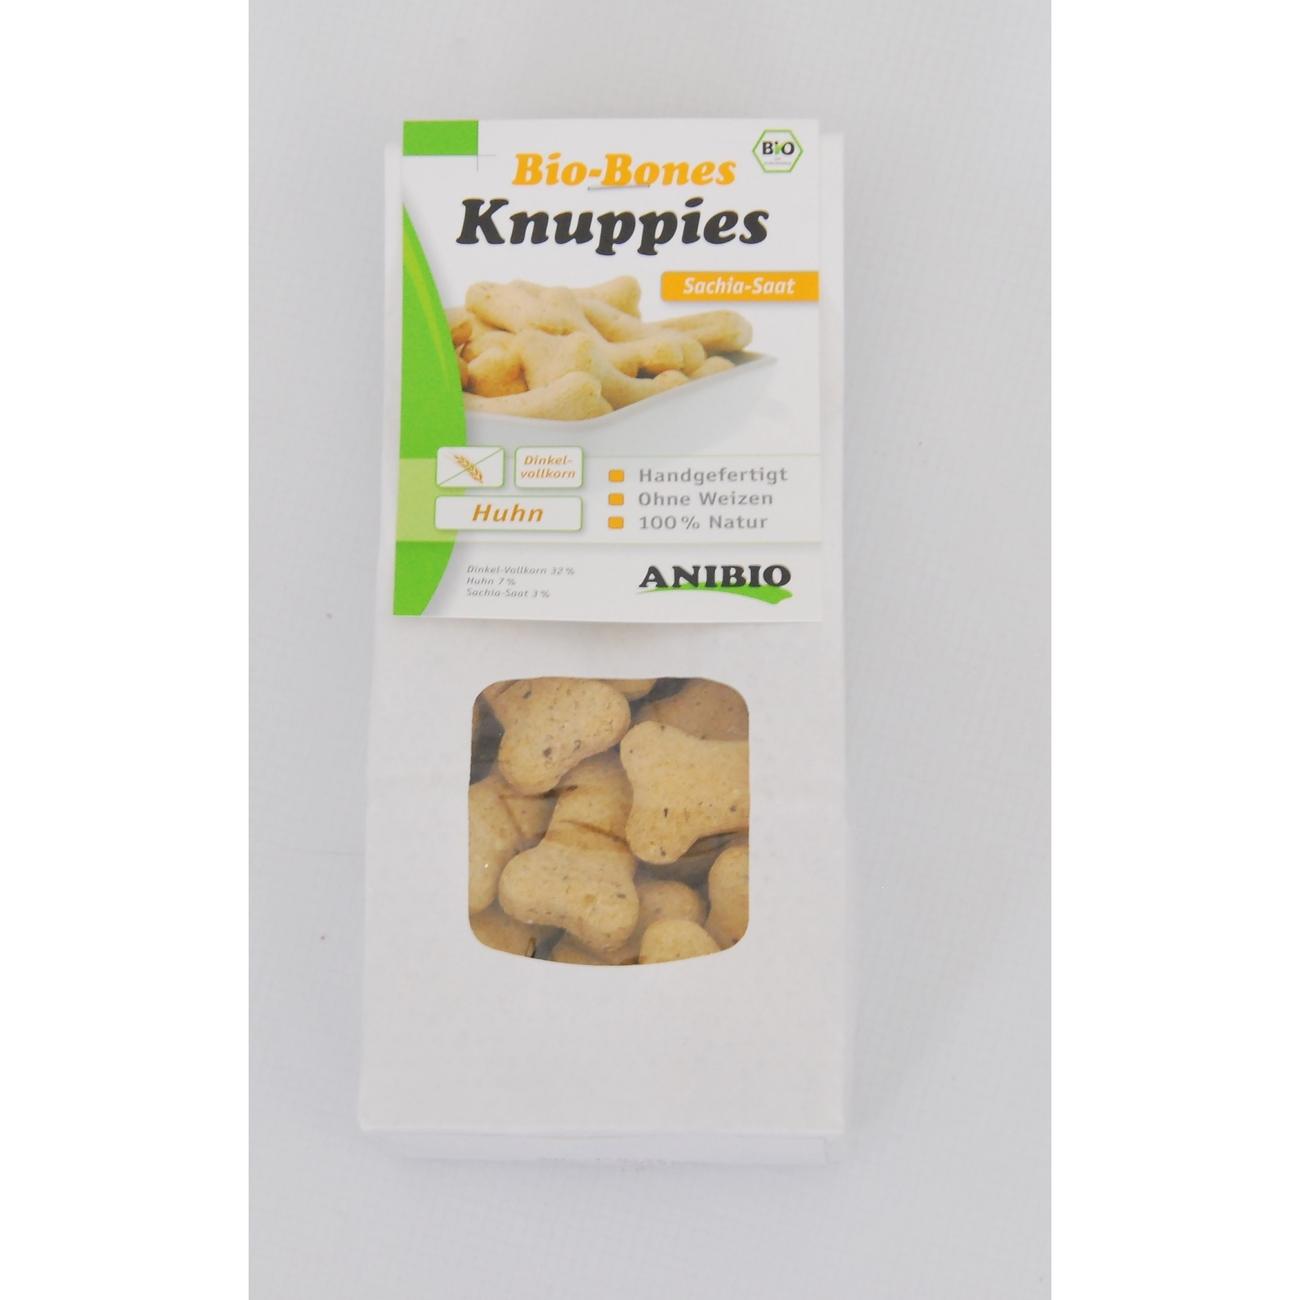 Anibio Knuppies BioBones - Sachia